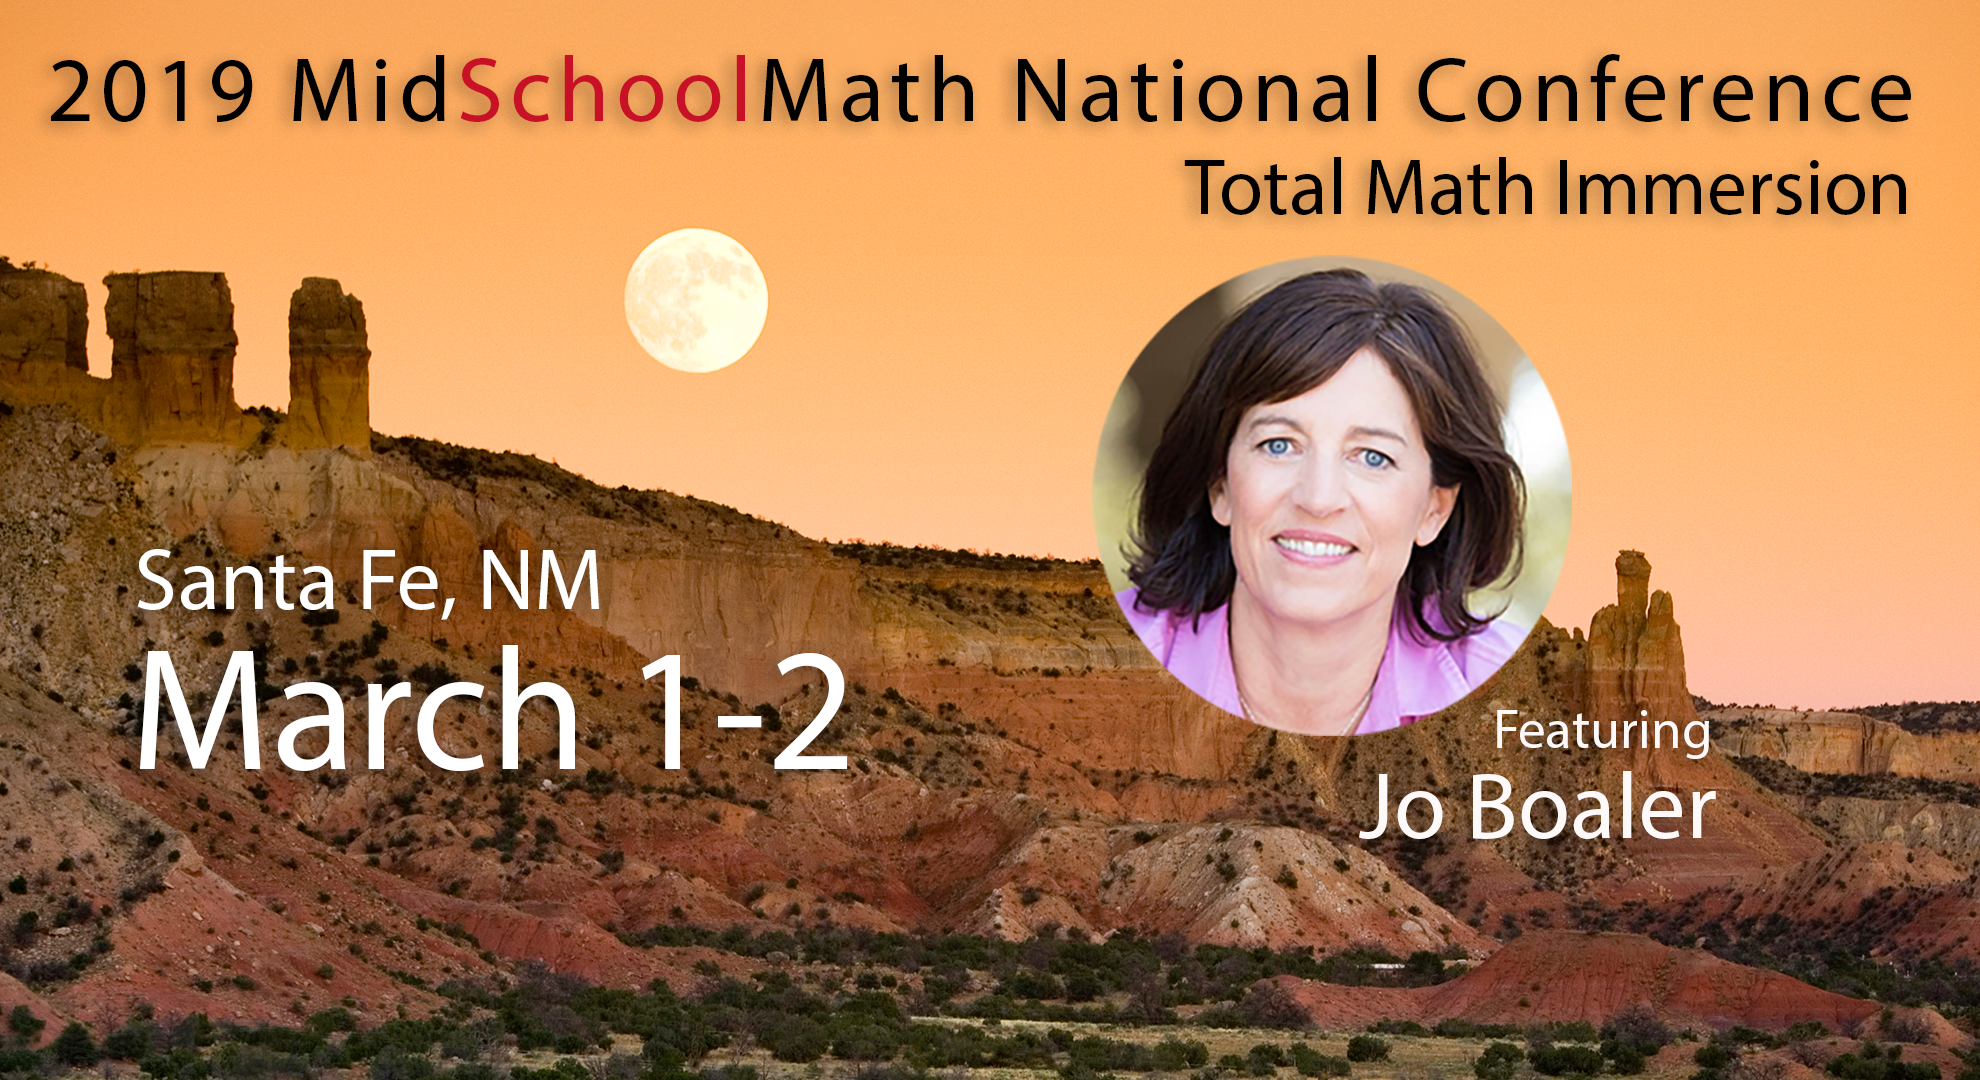 2019 MidSchoolMath National Conference - Santa Fe, NM - March 1-2